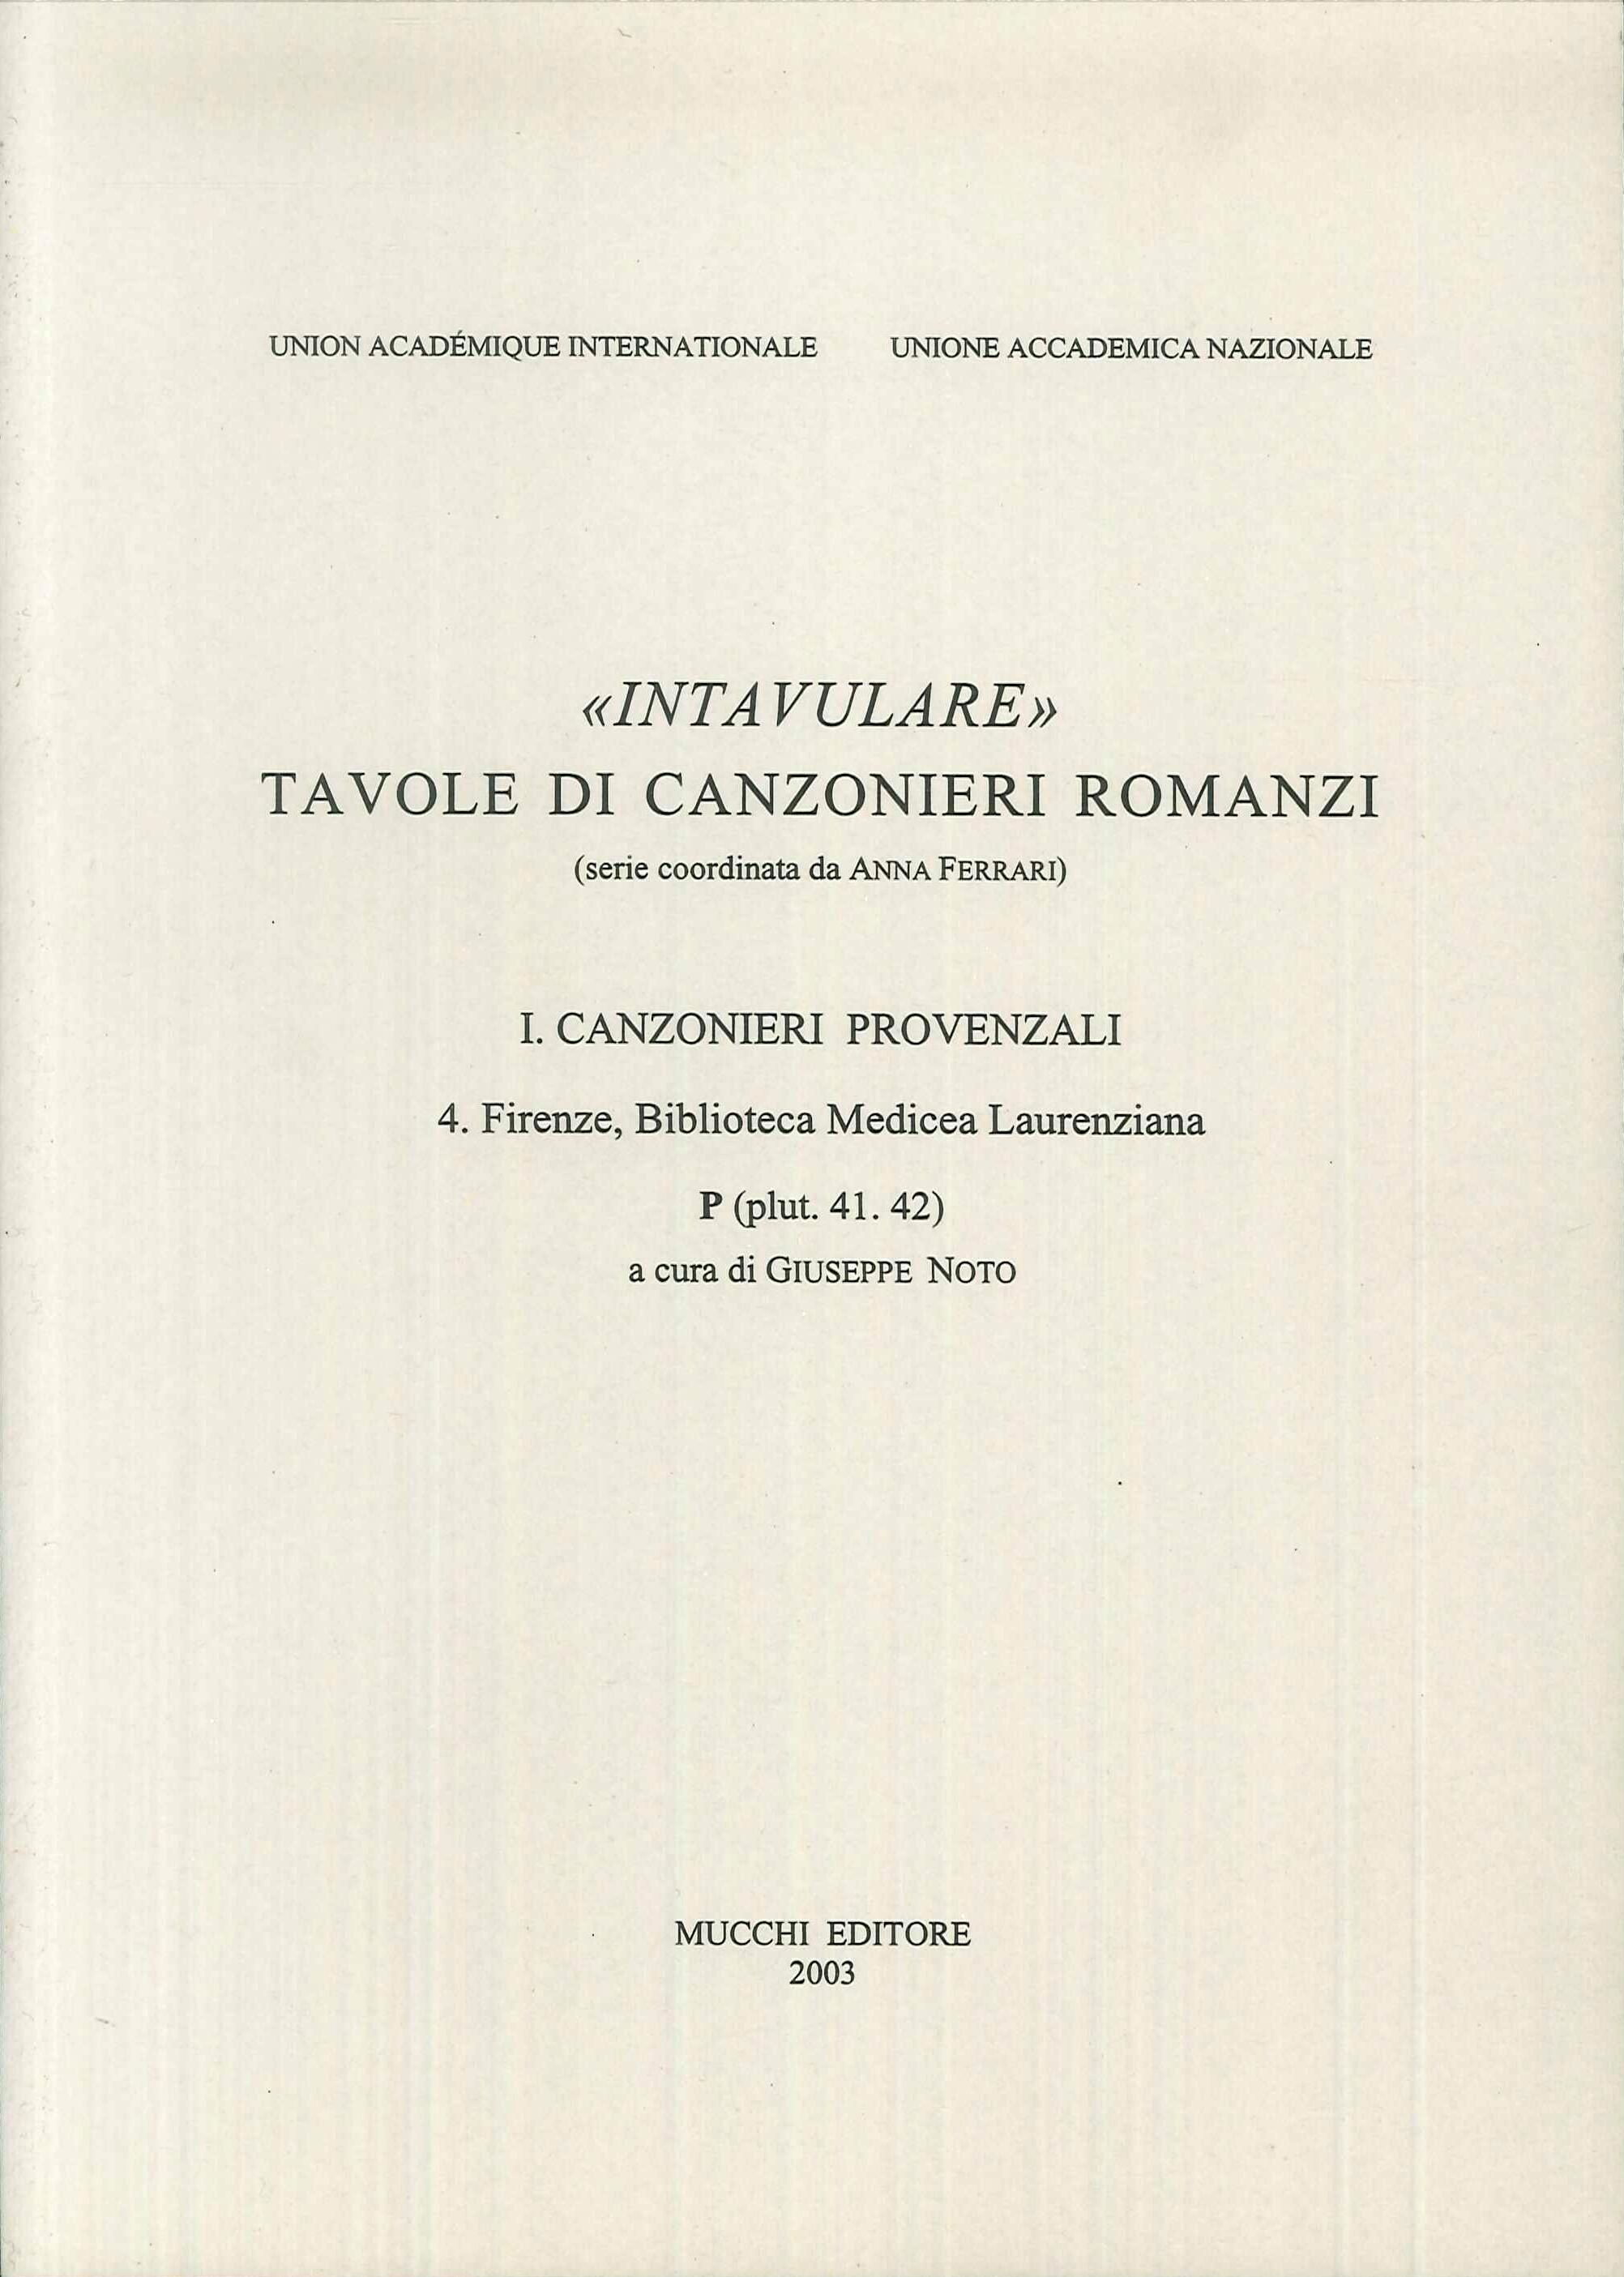 Intavulare. Tavole di Canzonieri Romanzi. Canzonieri Provenzali. Vol. 4: Firenze, Biblioteca Medicea Laurenziana. P (Plut. 41.42)